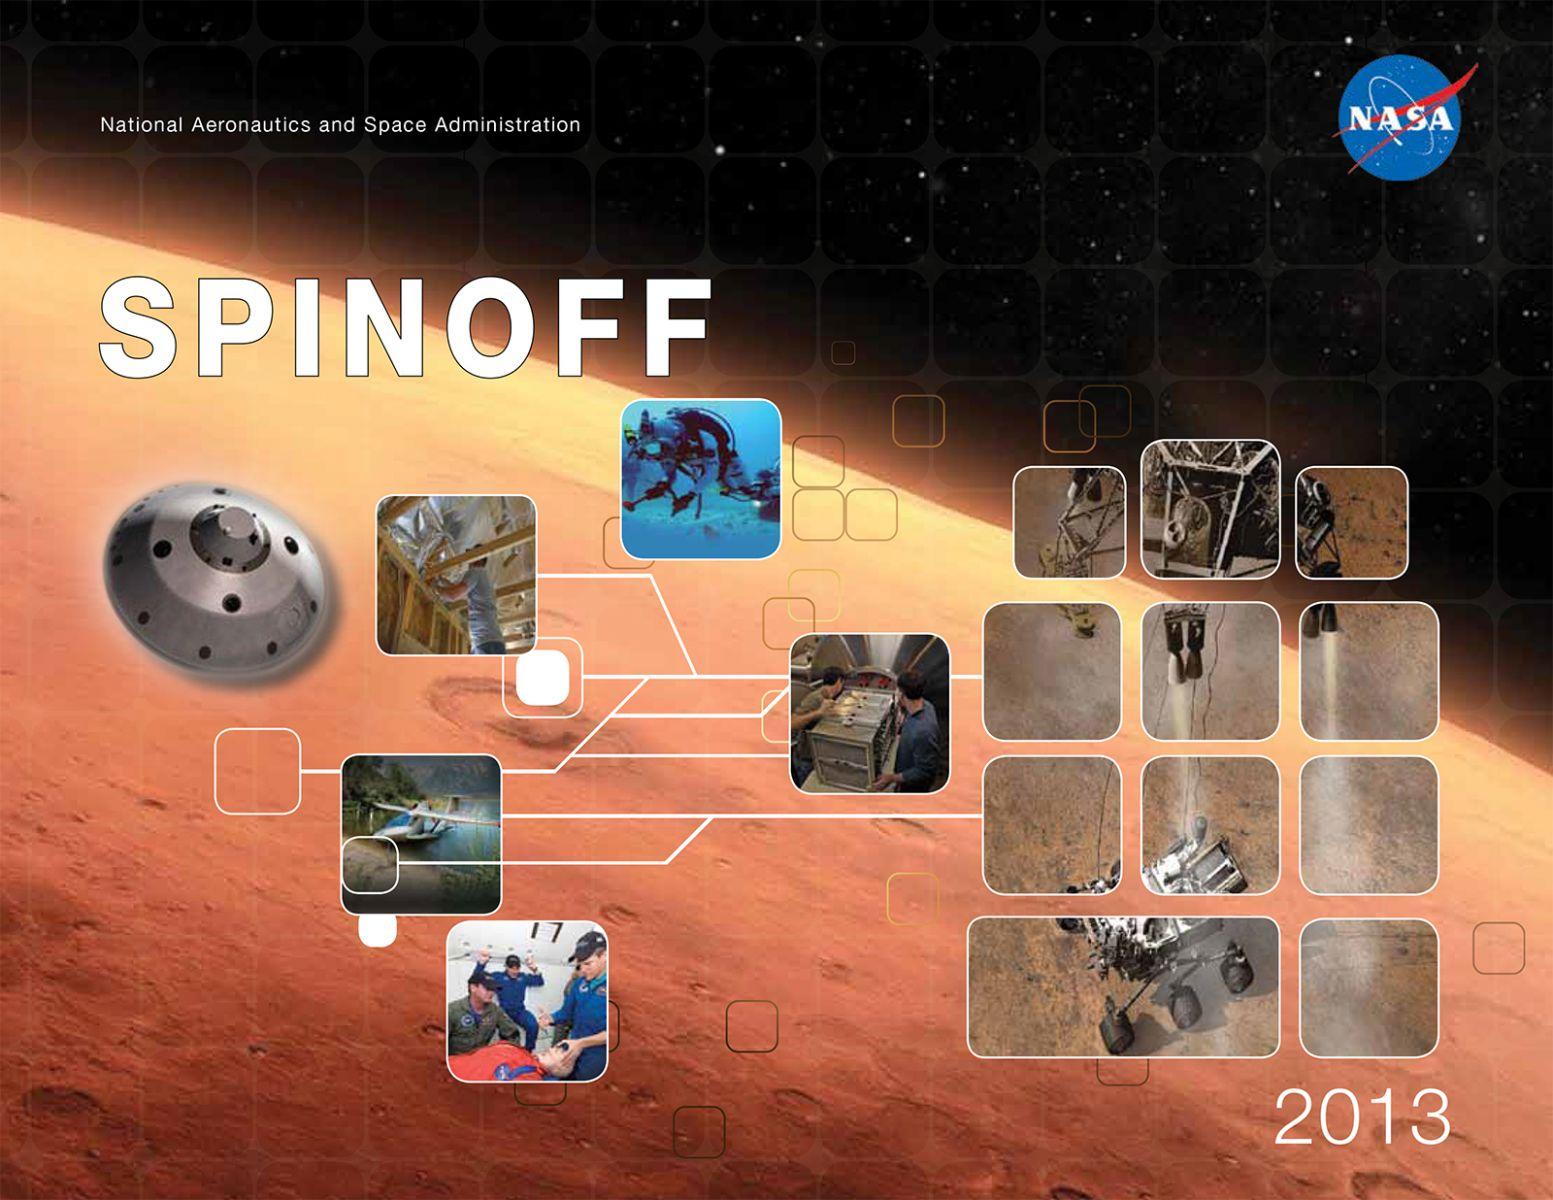 benefits of space shuttle program - photo #18